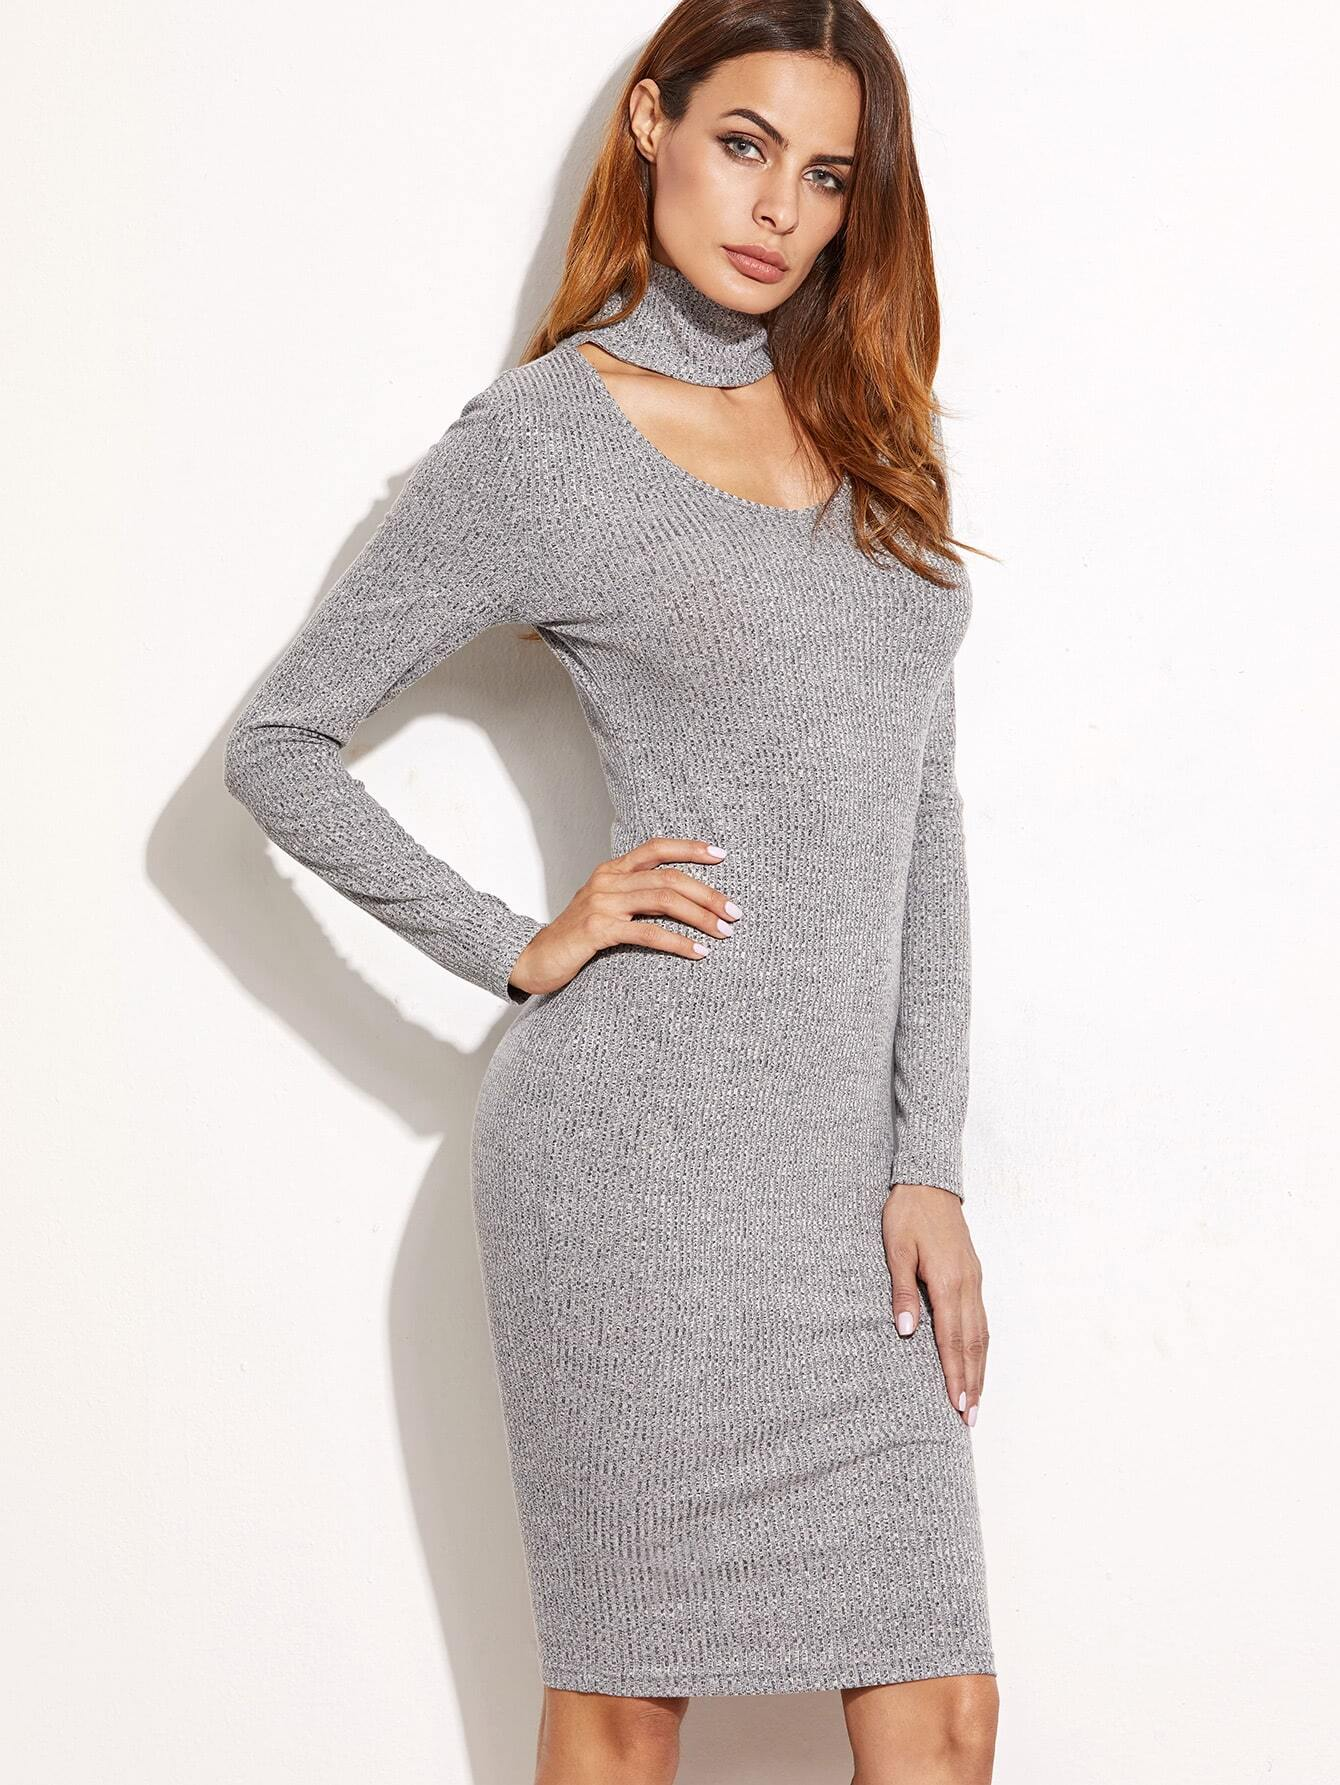 Heather Grey Ribbed Knit Cutout Choker Pencil Dress dress161103712